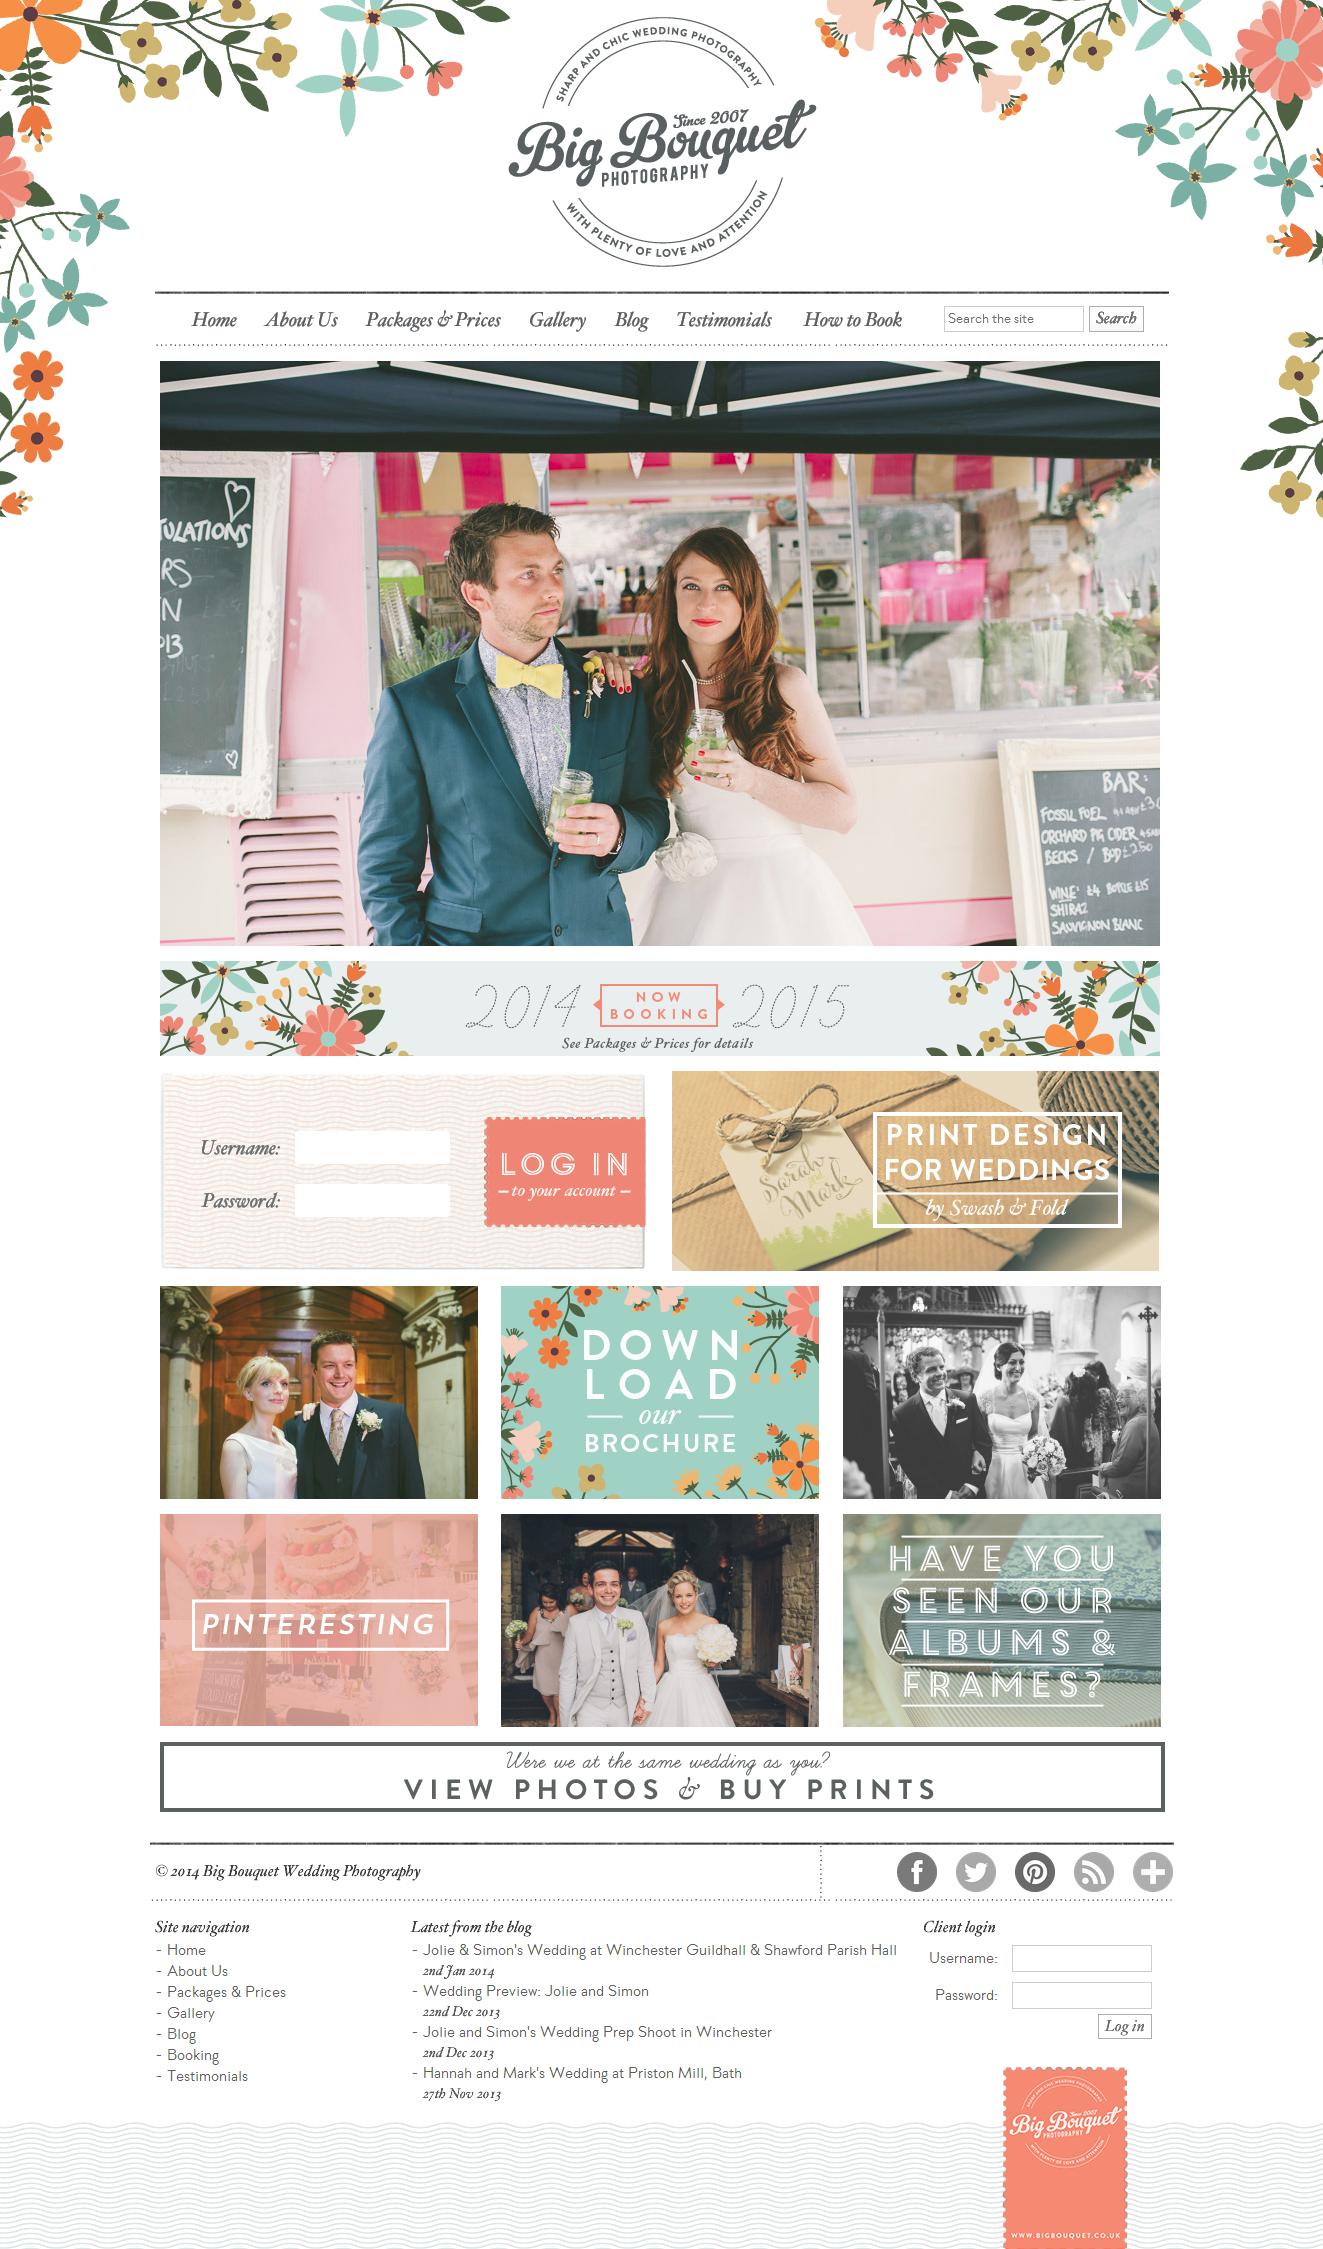 Wedding Photography Websites Inspiration: Big Bouquet Wedding Photography Website